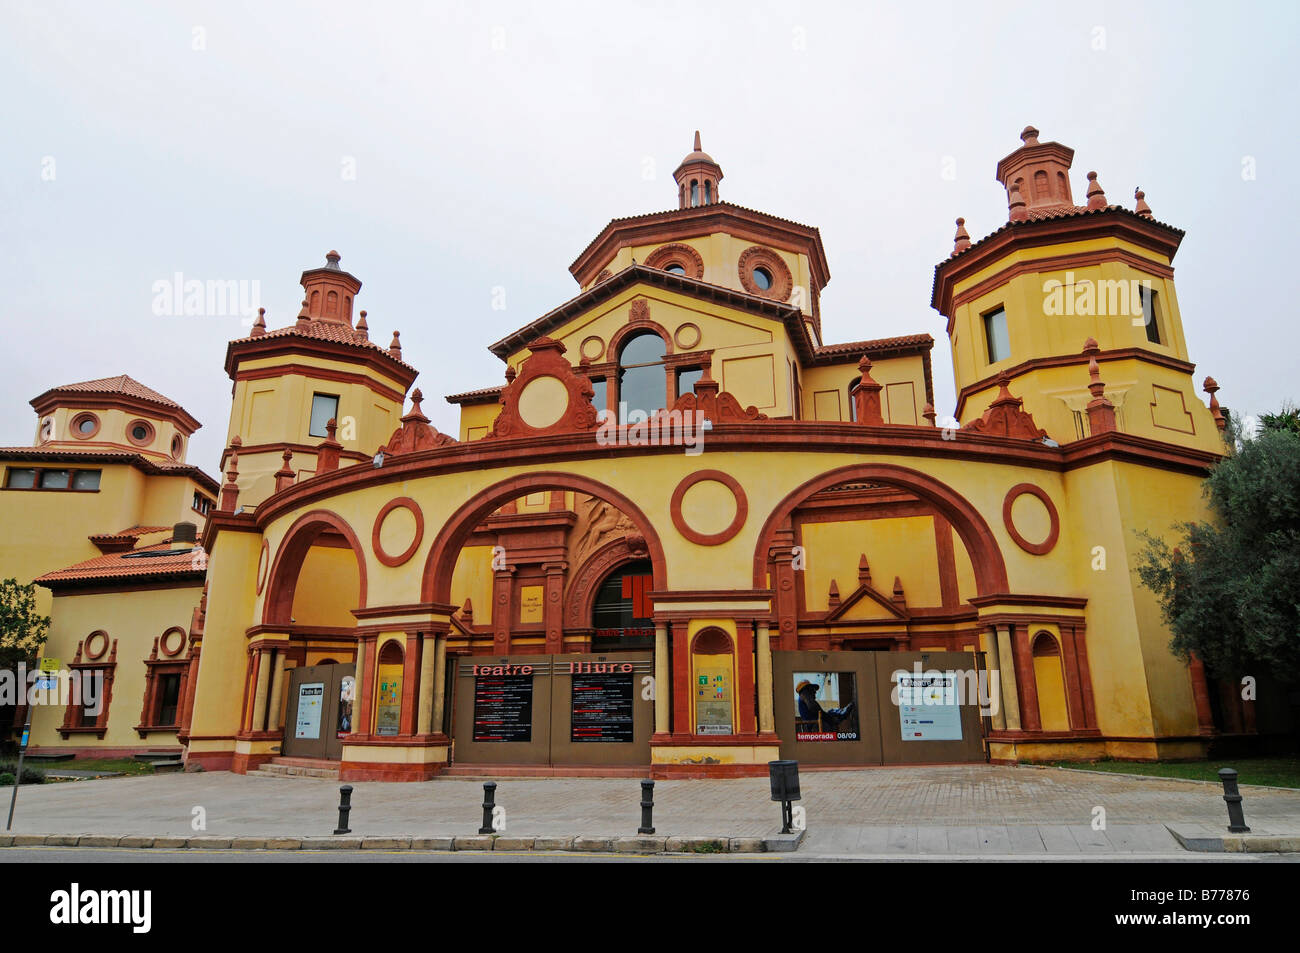 Facade, Teatre Lliure, Catalan theatre, Montjuic, Barcelona, Catalonia, Spain, Europe - Stock Image